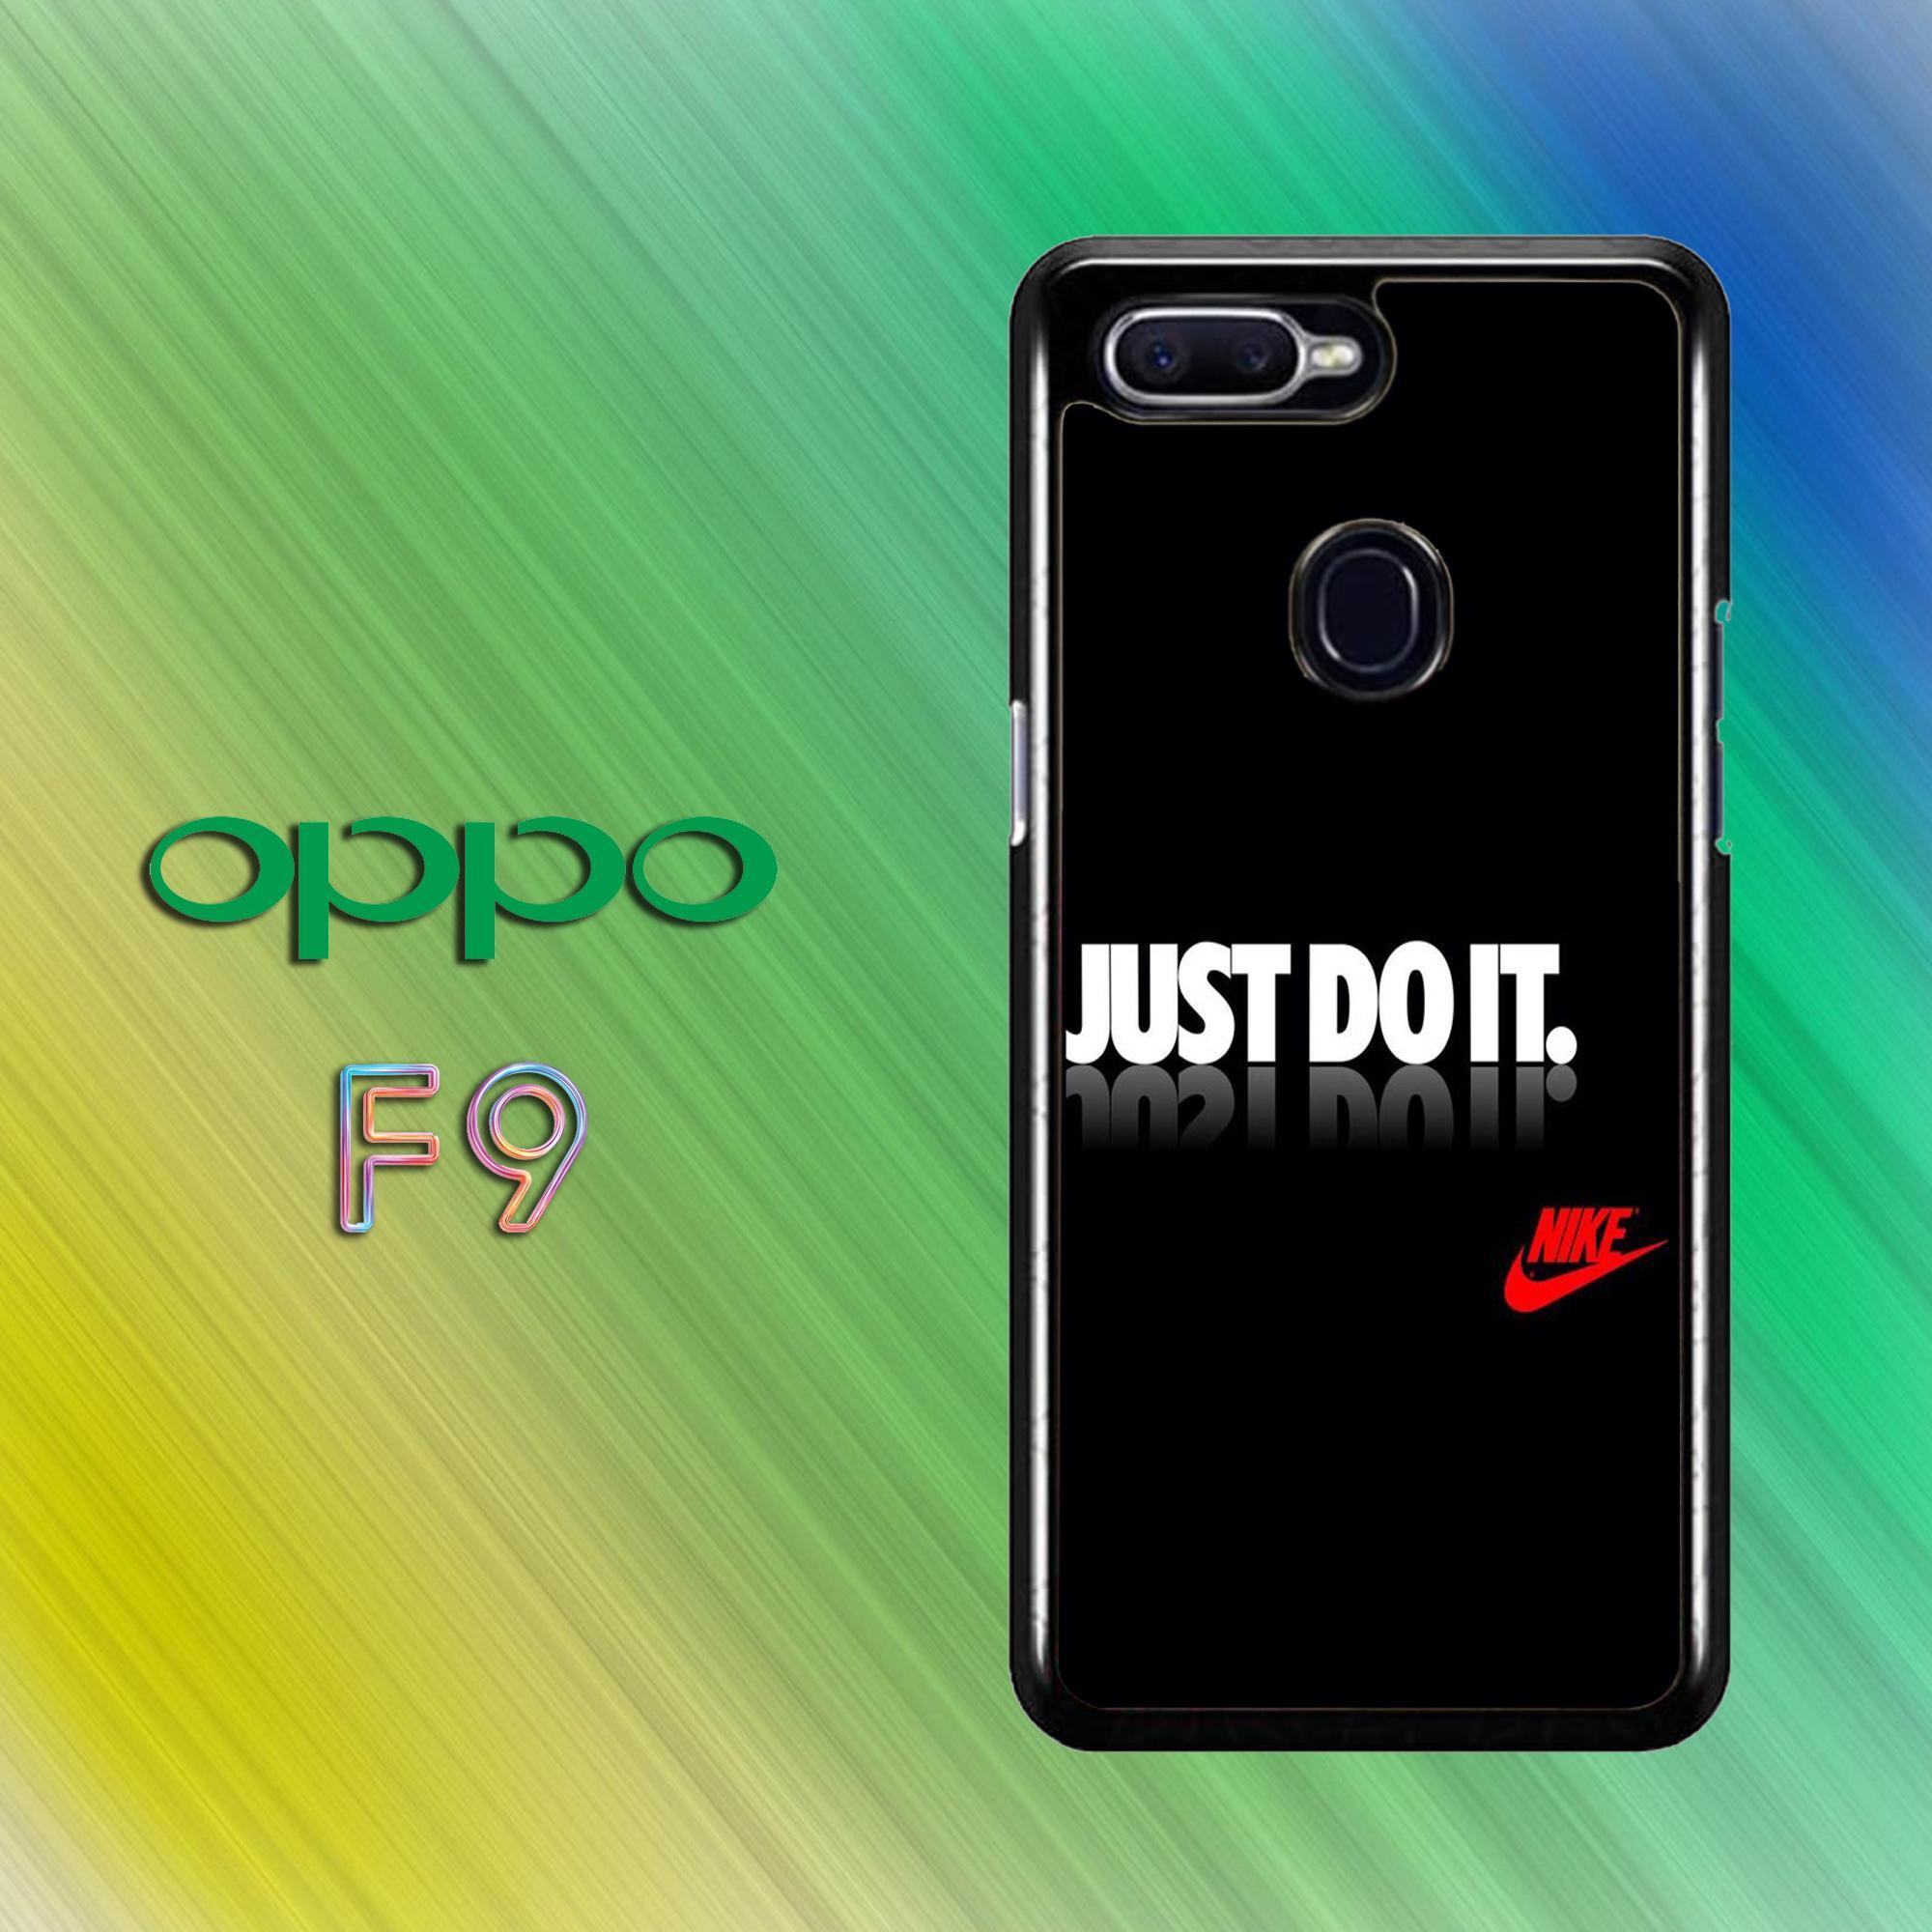 Features Bcs Case Nike Fashion Printing Phone Oppo F9 Dan Harga